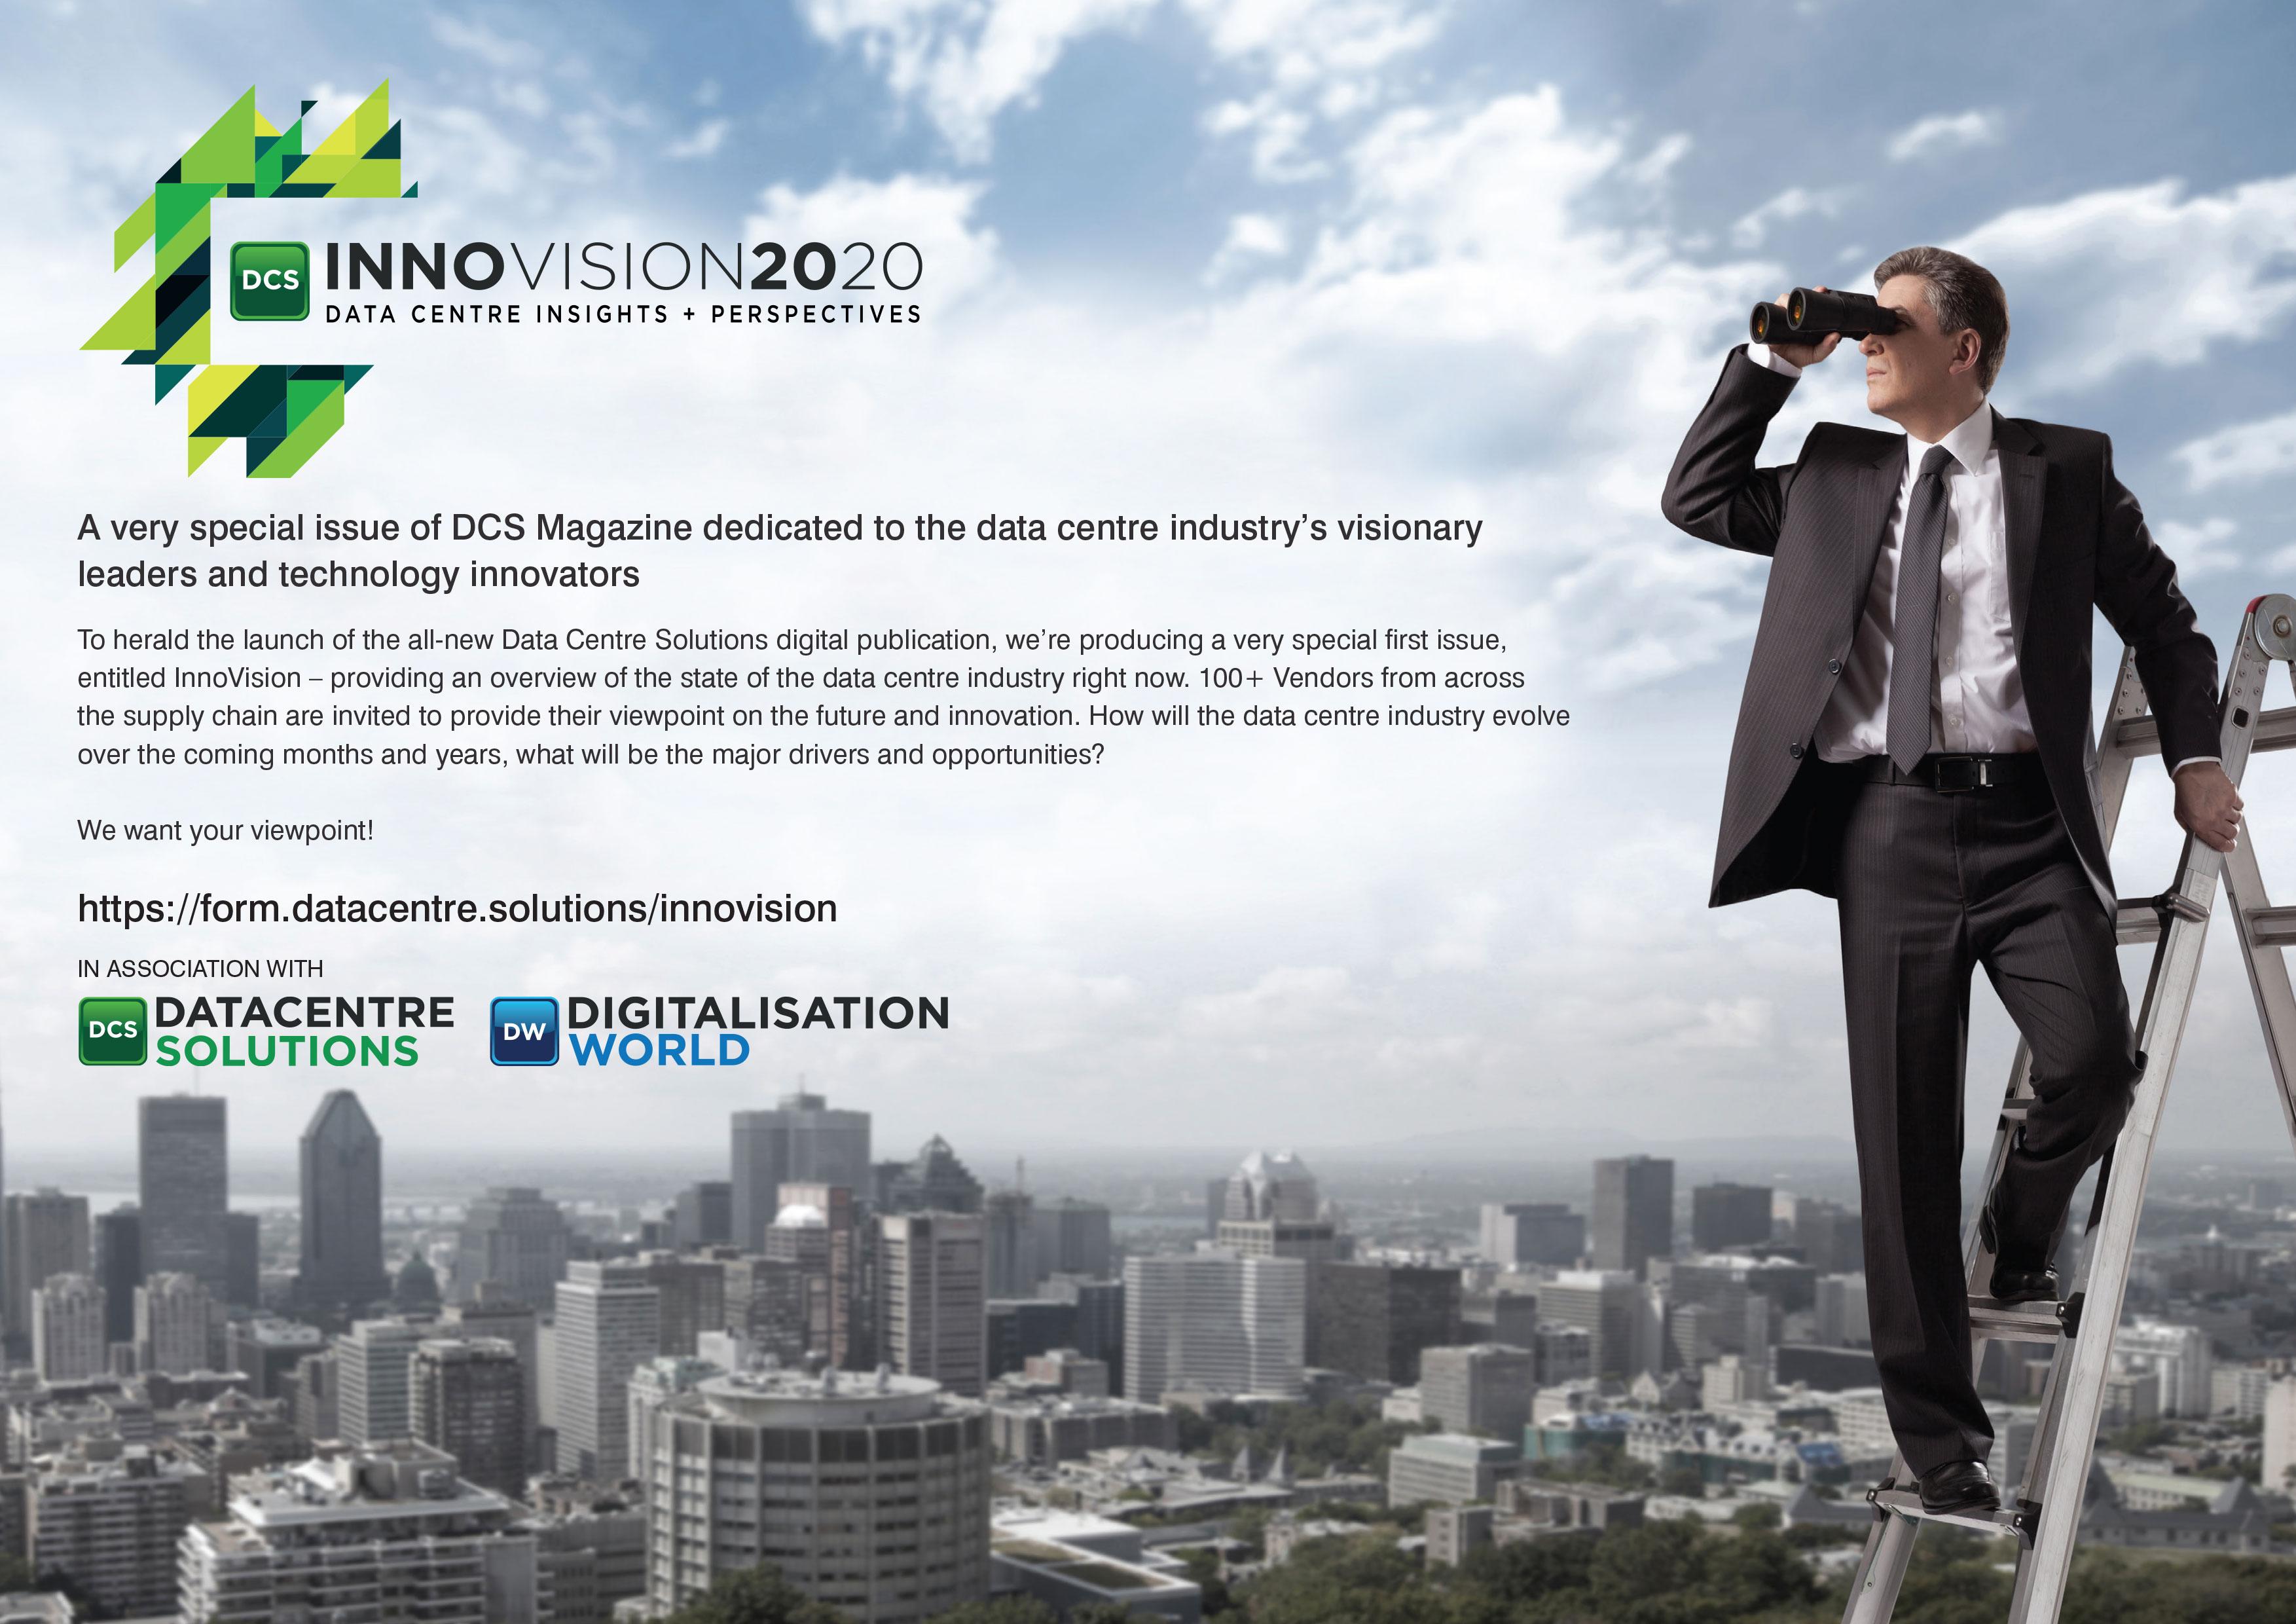 DCS_Innovision